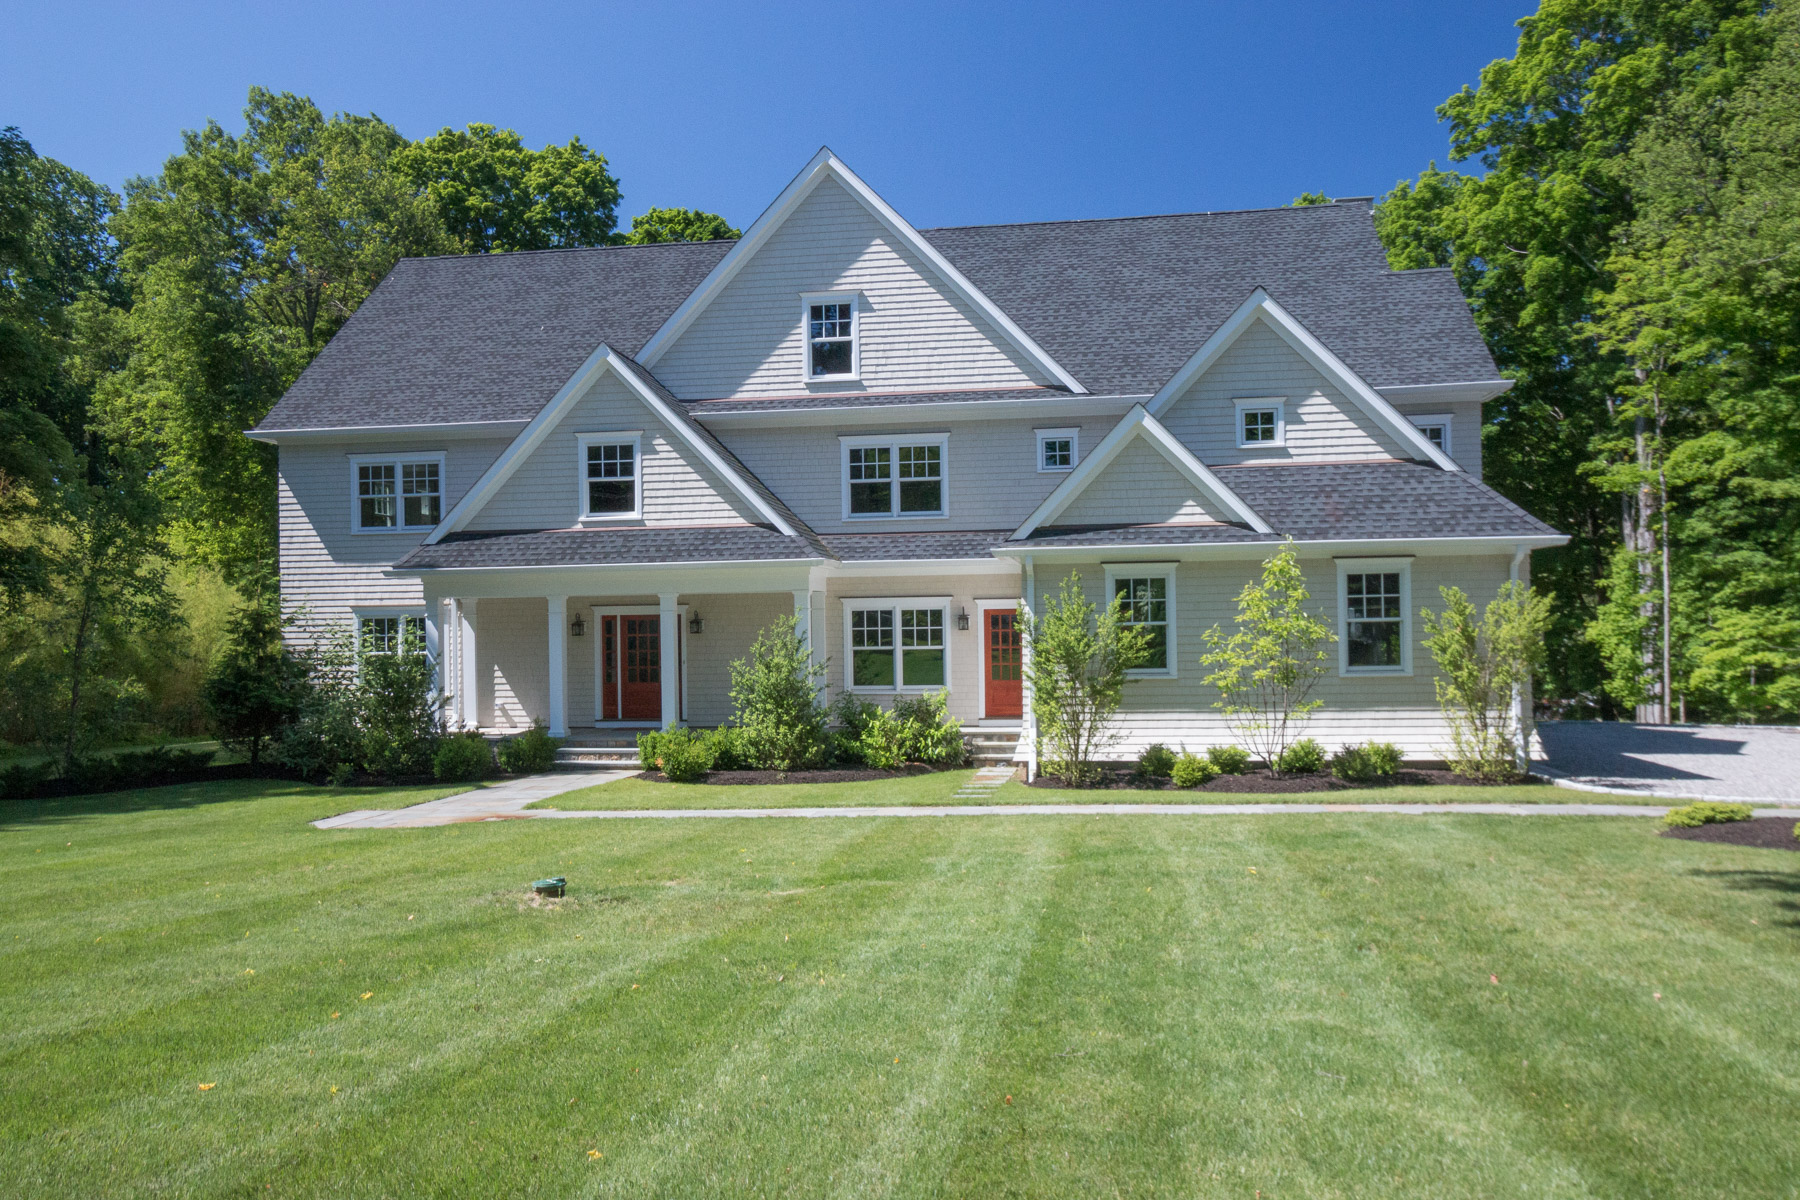 Casa Unifamiliar por un Venta en 71 Hurlbutt Street 71 Hurlbutt Street Wilton, Connecticut 06897 Estados Unidos